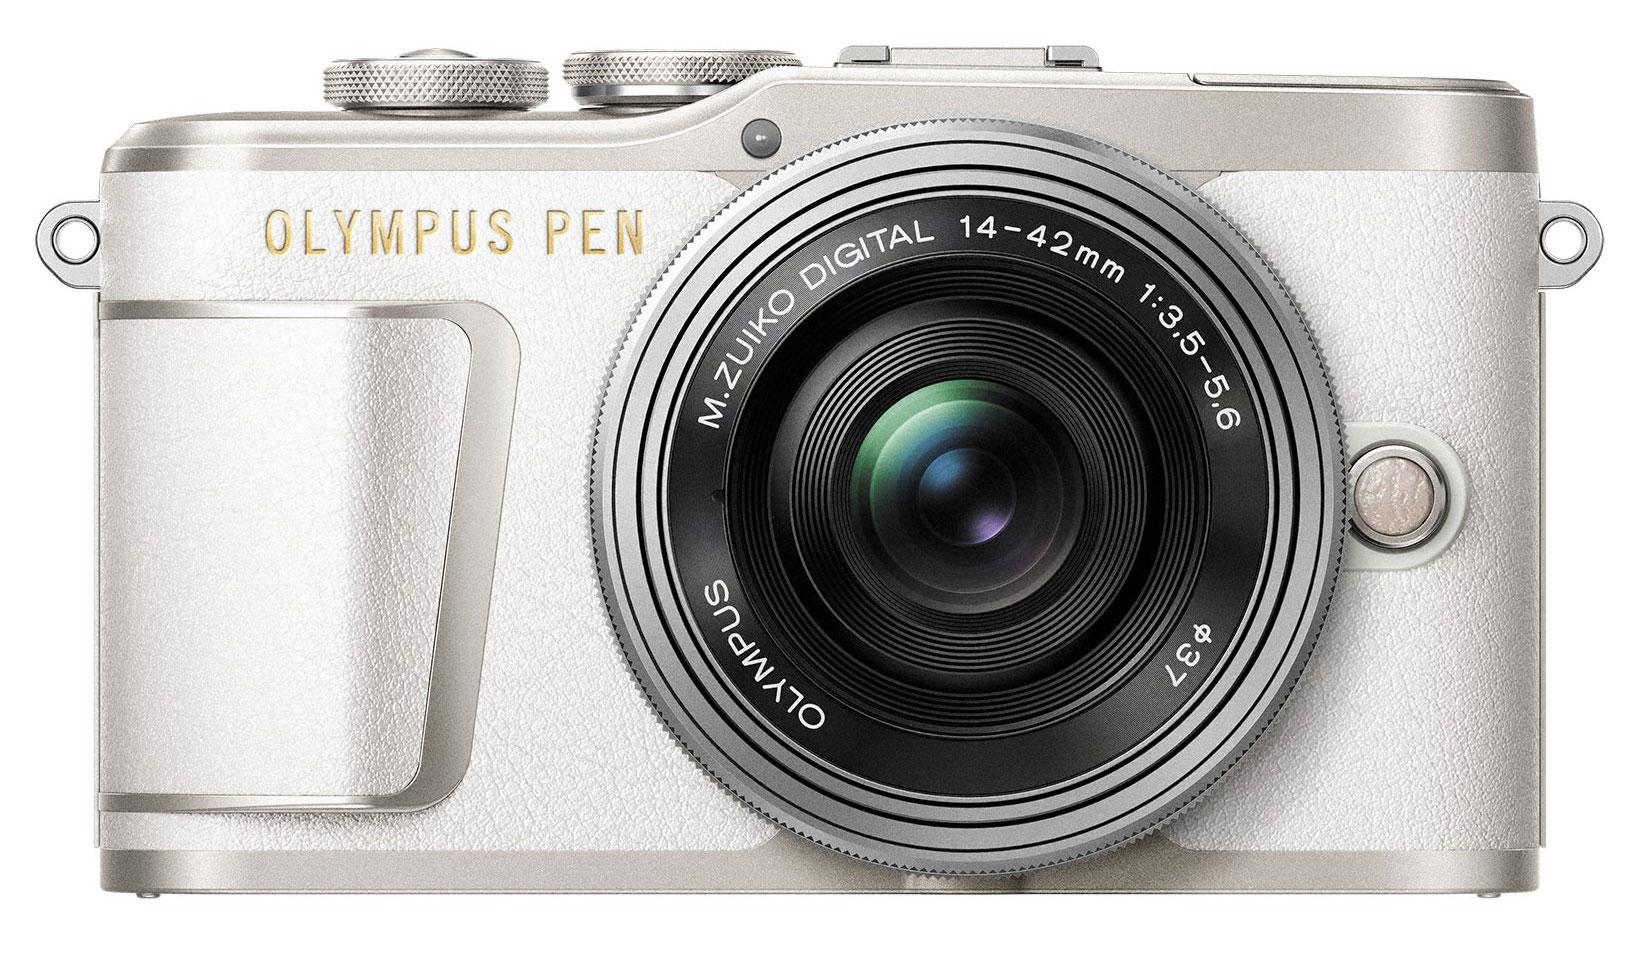 Olympus PEN E-PL9 - Camera.tinhte.vn 8.jpg